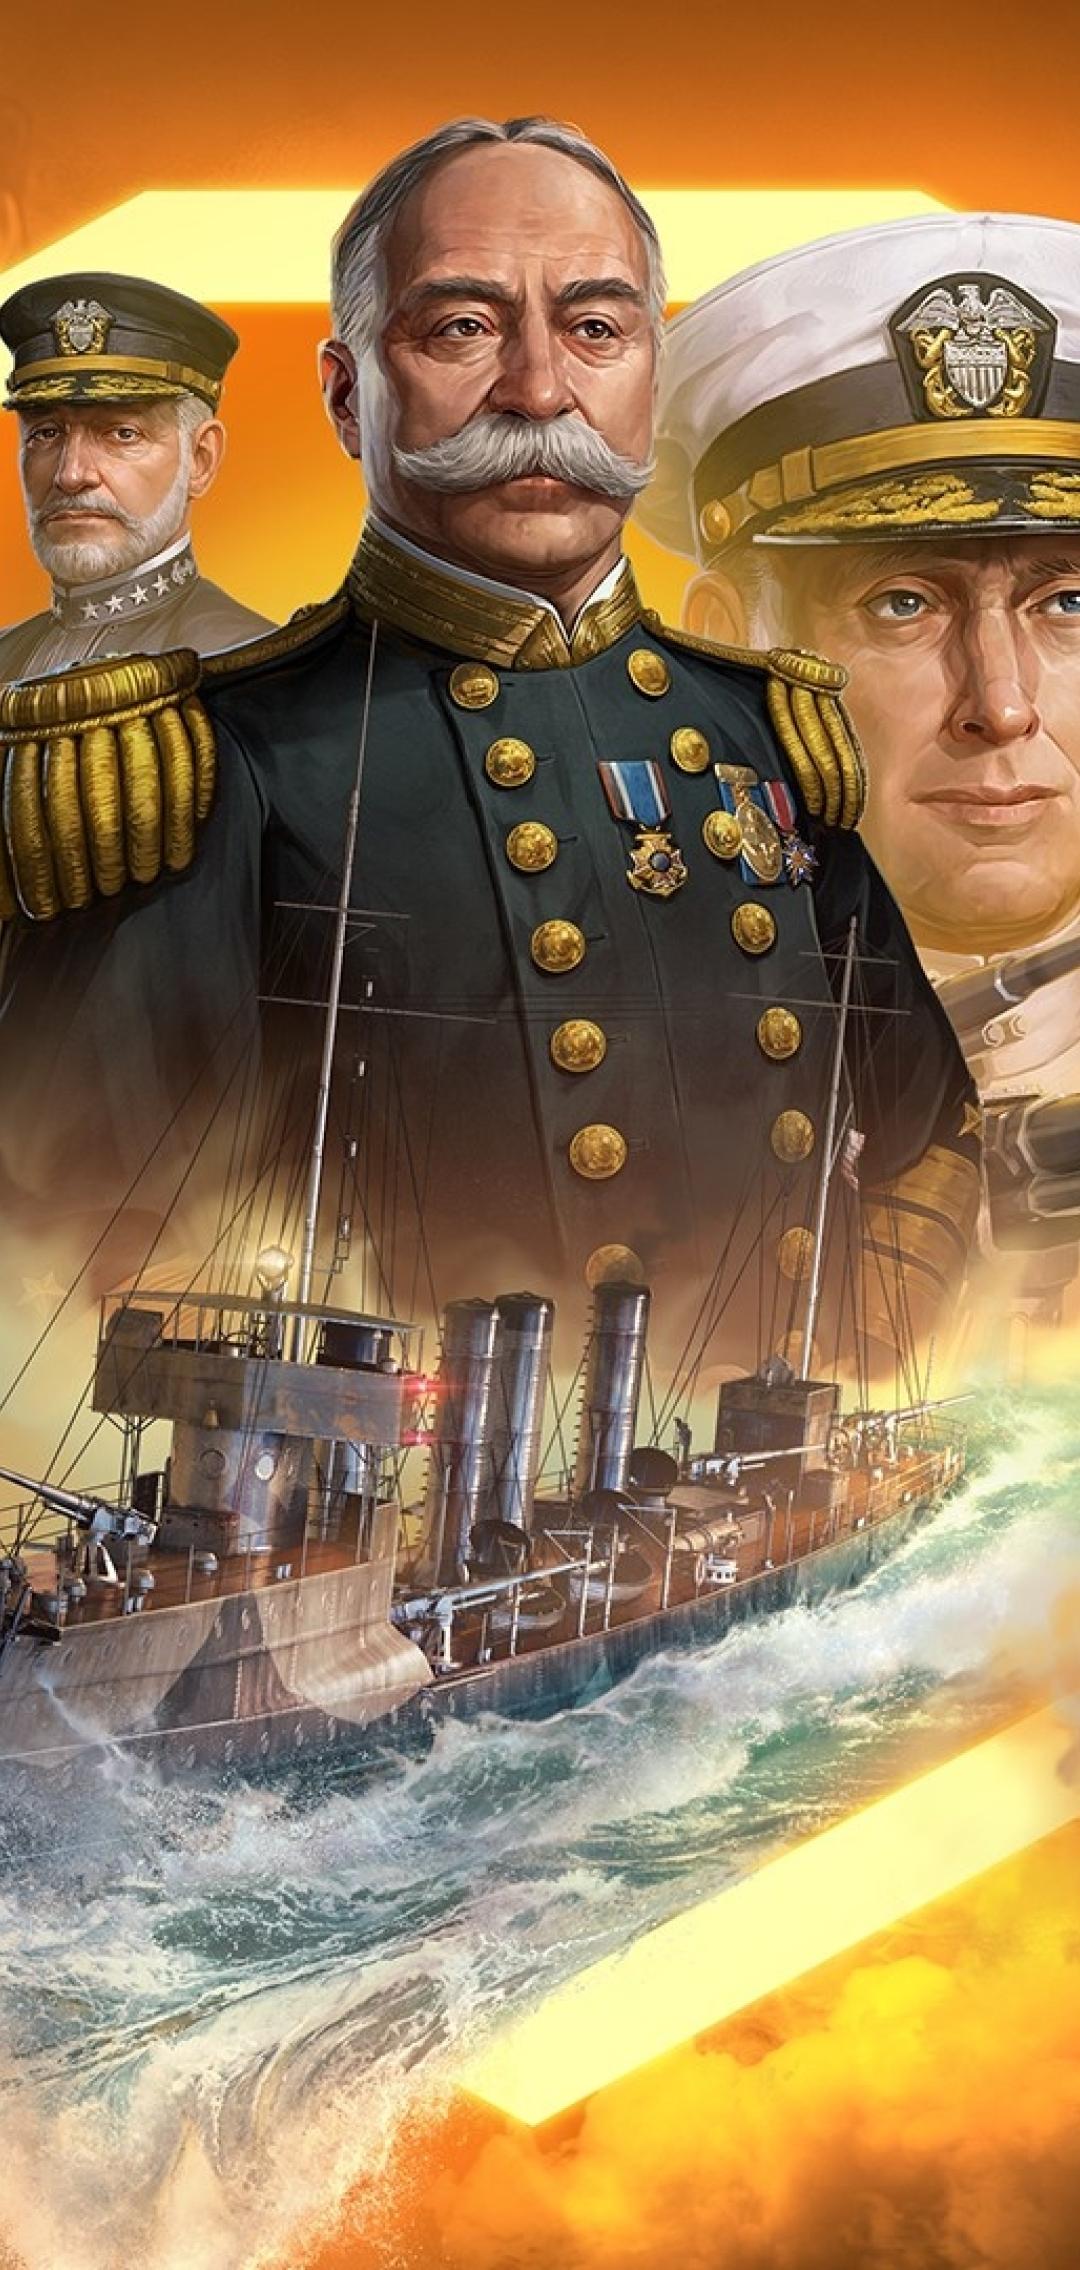 1080x2270 World of Warships Legends - Rising Legend 1080x2270 Resolution Wallpaper, HD Games 4K ...